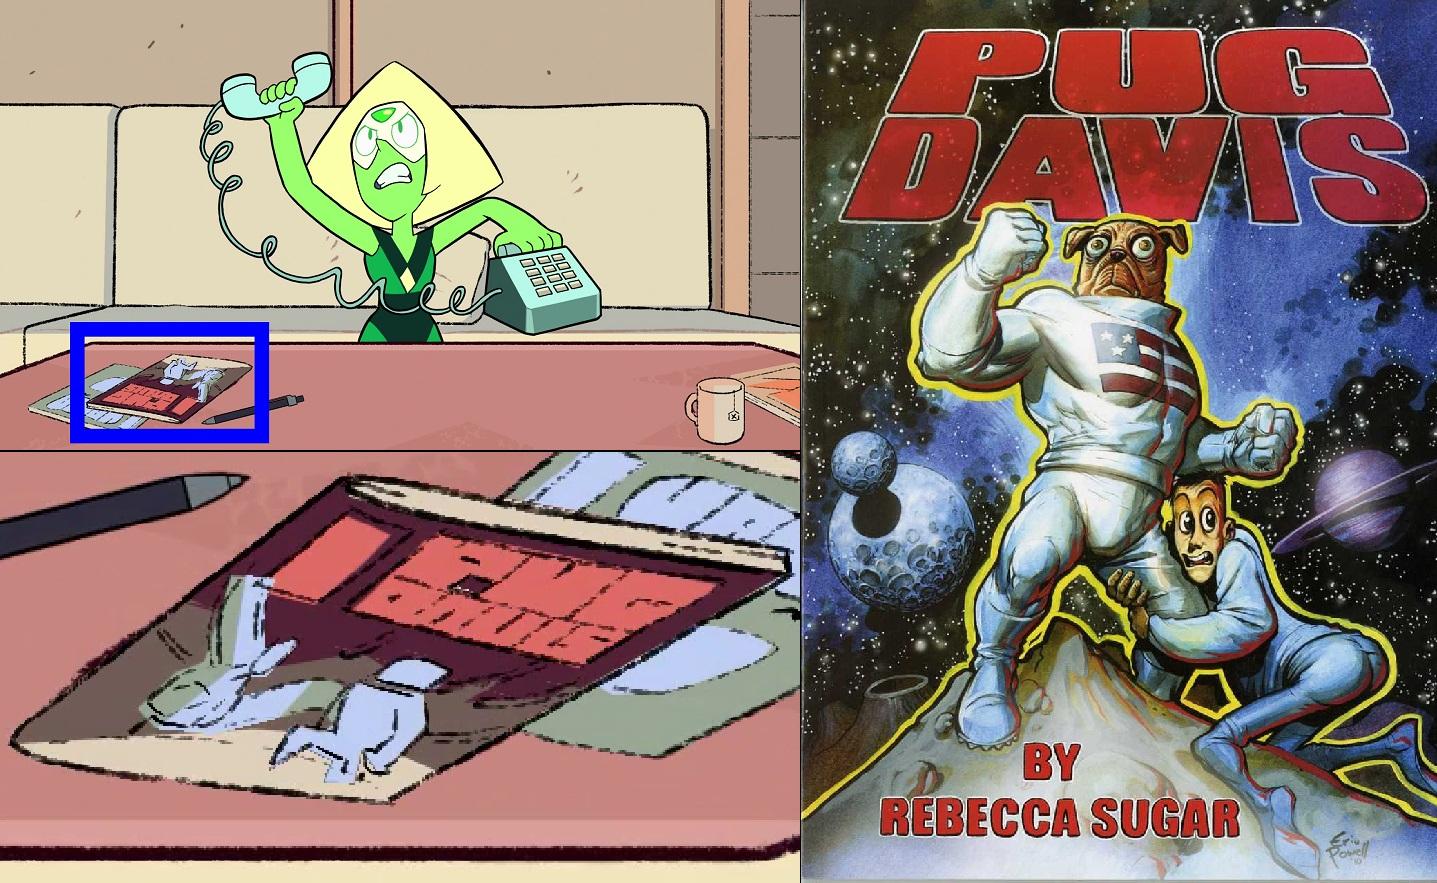 Sucrose S Old Comic Pug Davis In Back To The Barn Steven Universe